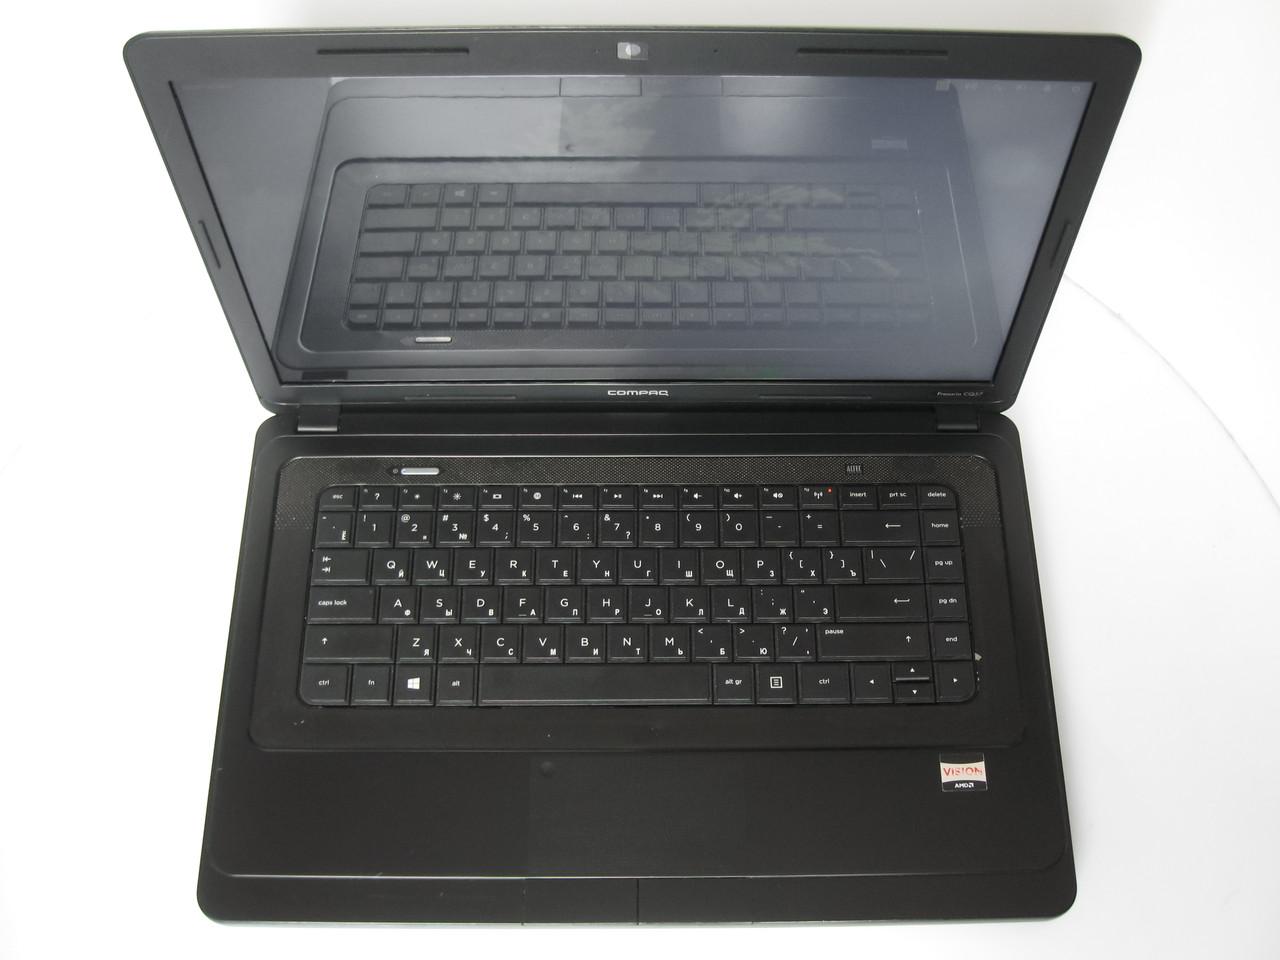 Ноутбук HP Compaq CQ57 15.6 (1366x768) / AMD E300 (2x1.3GHz) / Radeon  3